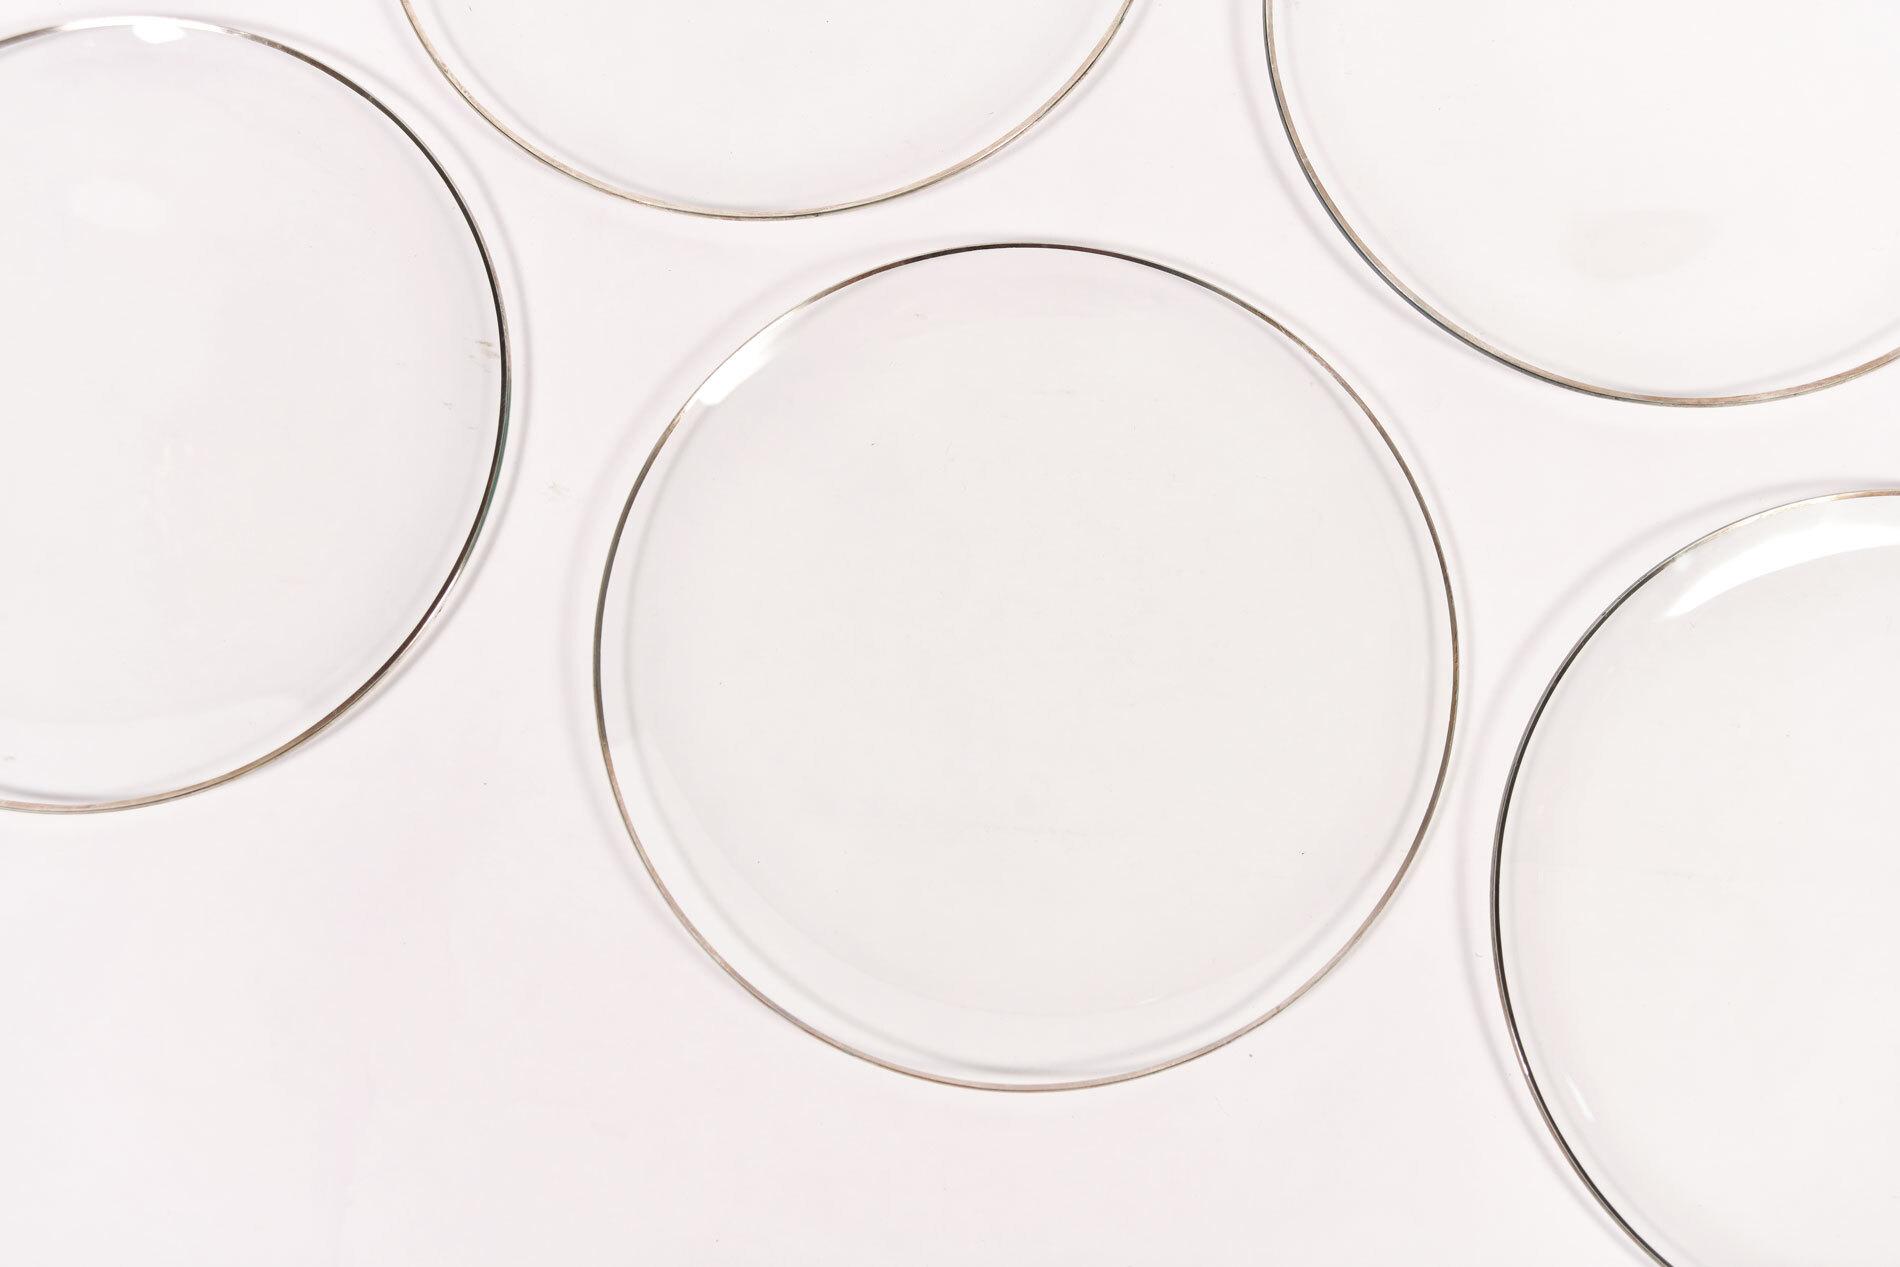 Set Six Glass Plates 04